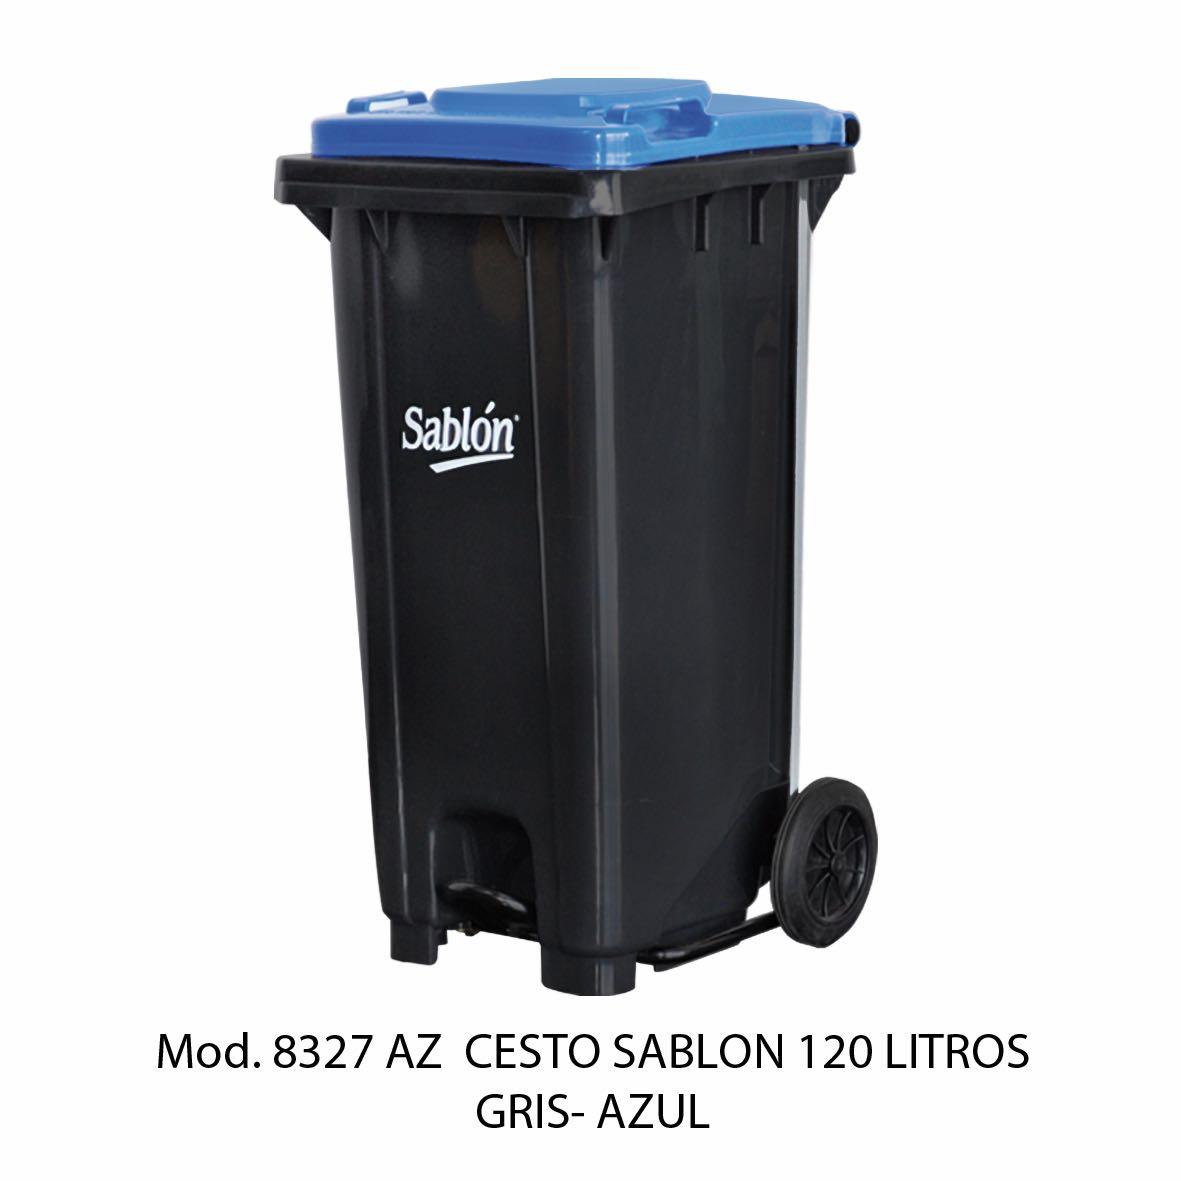 Contenedor para basura de 120 litros cuerpo gris y tapa azul - Modelo 8327 AZ - Sablón